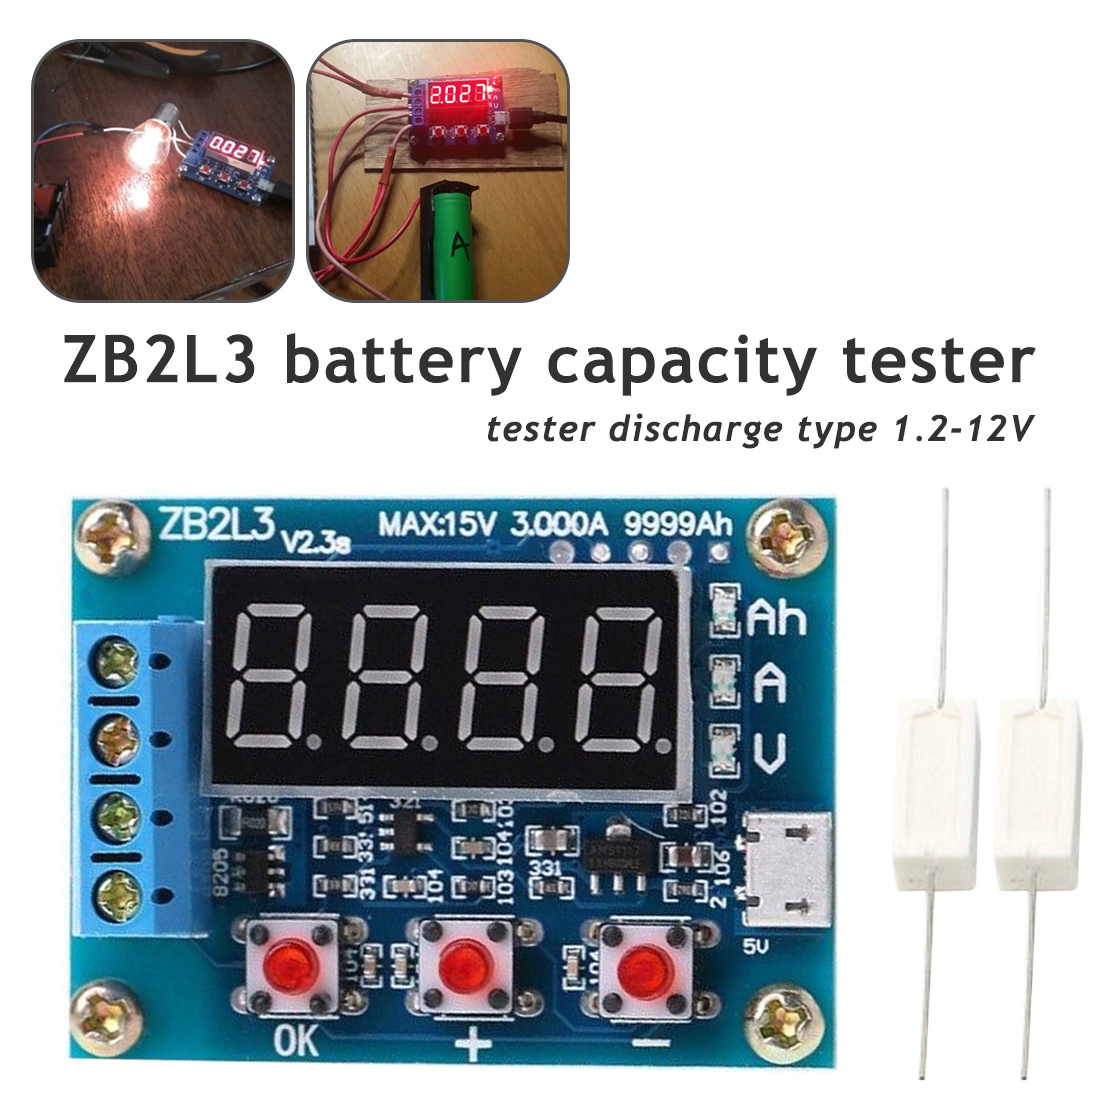 Battery Charging Indicator External load Li-ion Lithium Lead-acid Battery 1.2-12V Analyzer Discharge Tester ZB2L3 Battery Tester